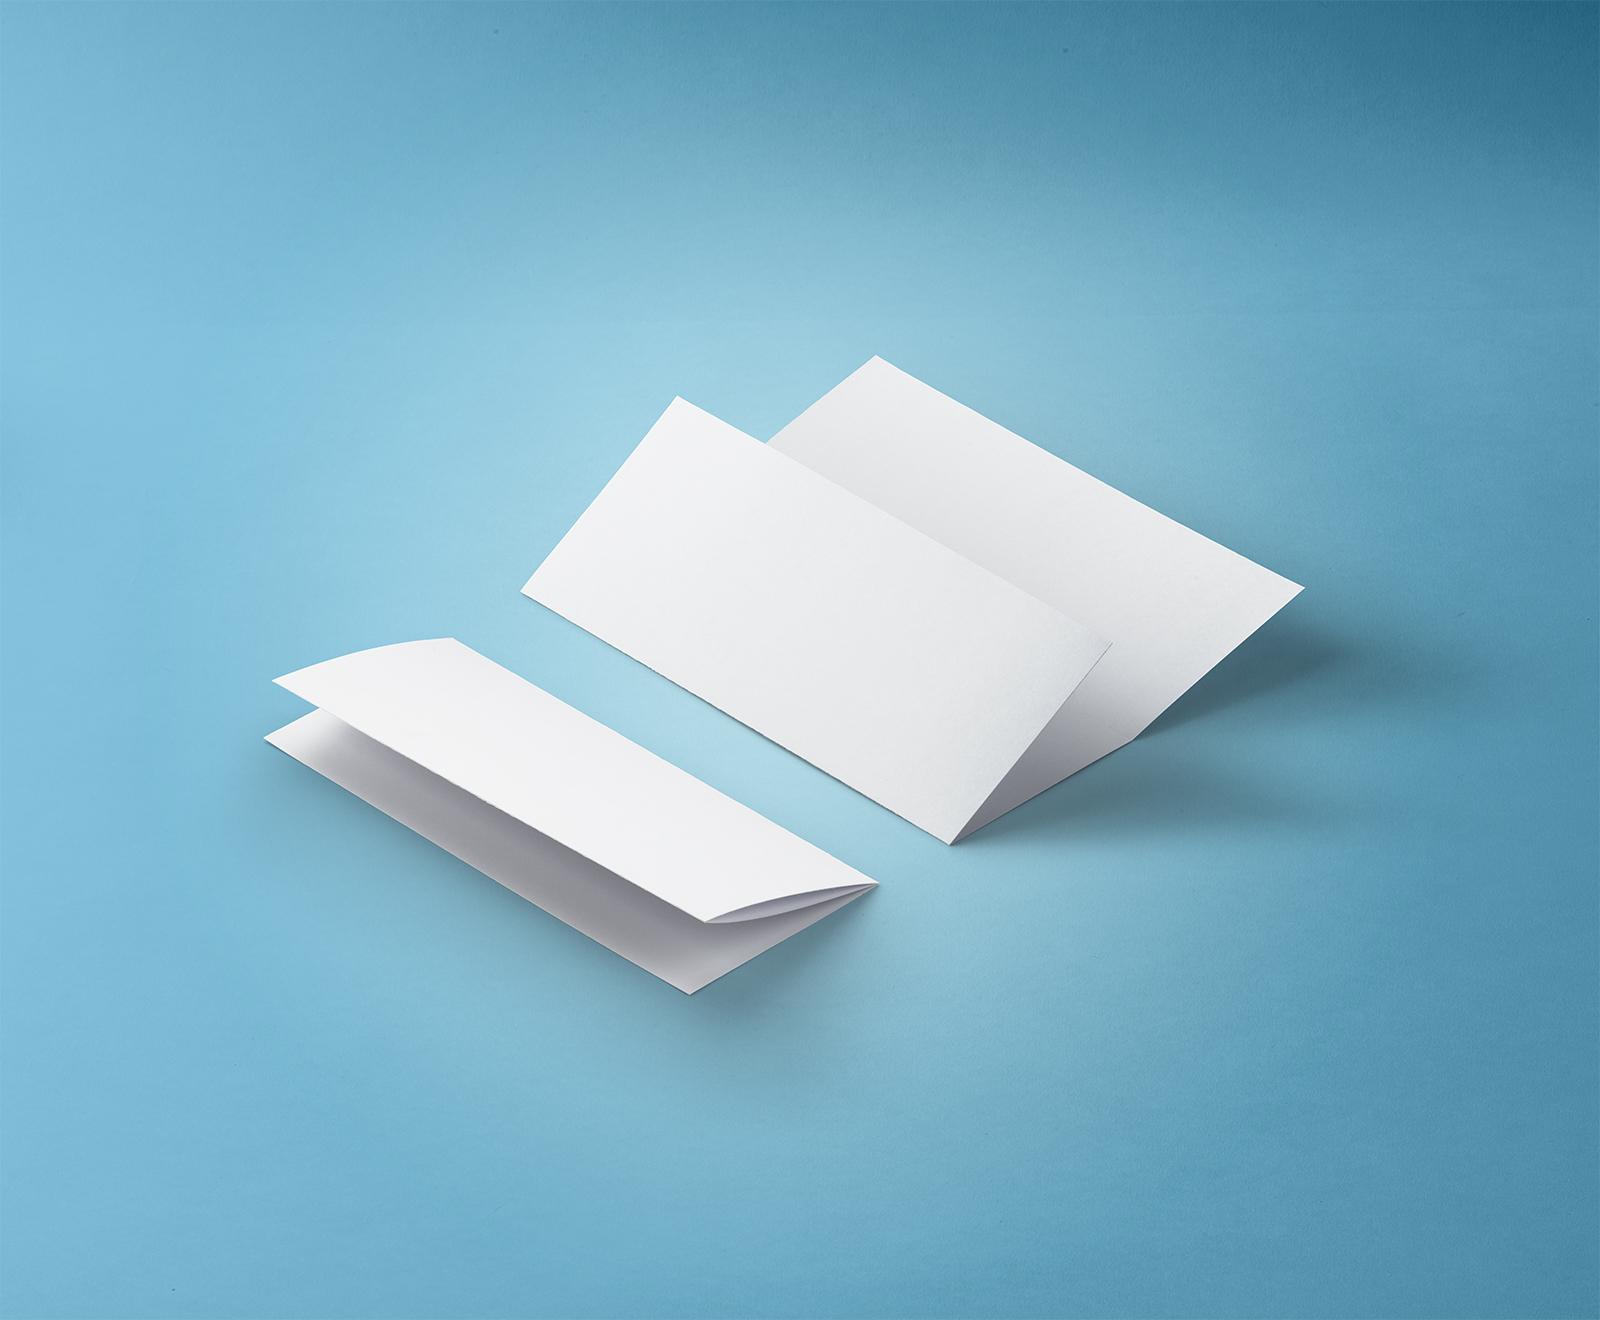 Free Tri-Fold Brochure 8.5x11 Inch Mockup